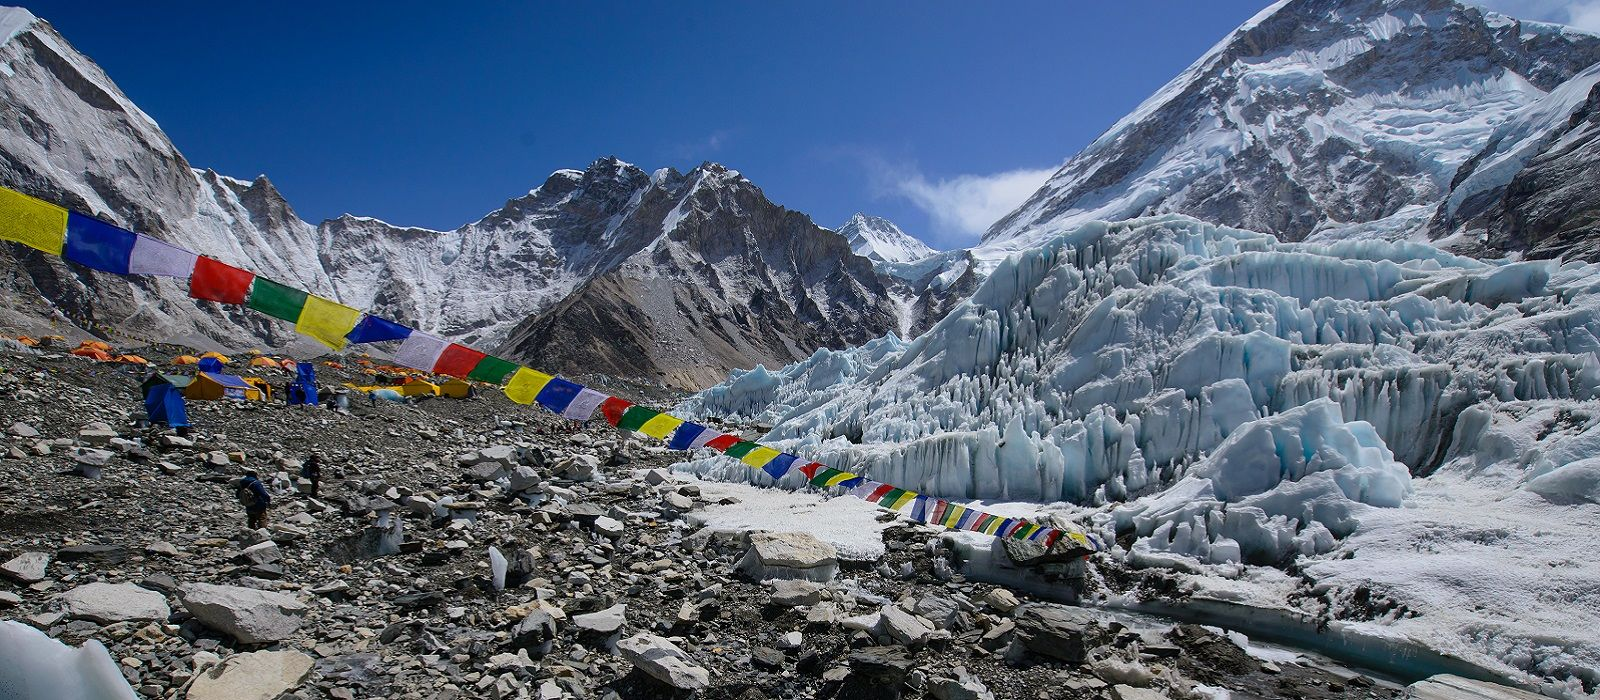 Destination Mount Everest Tibet